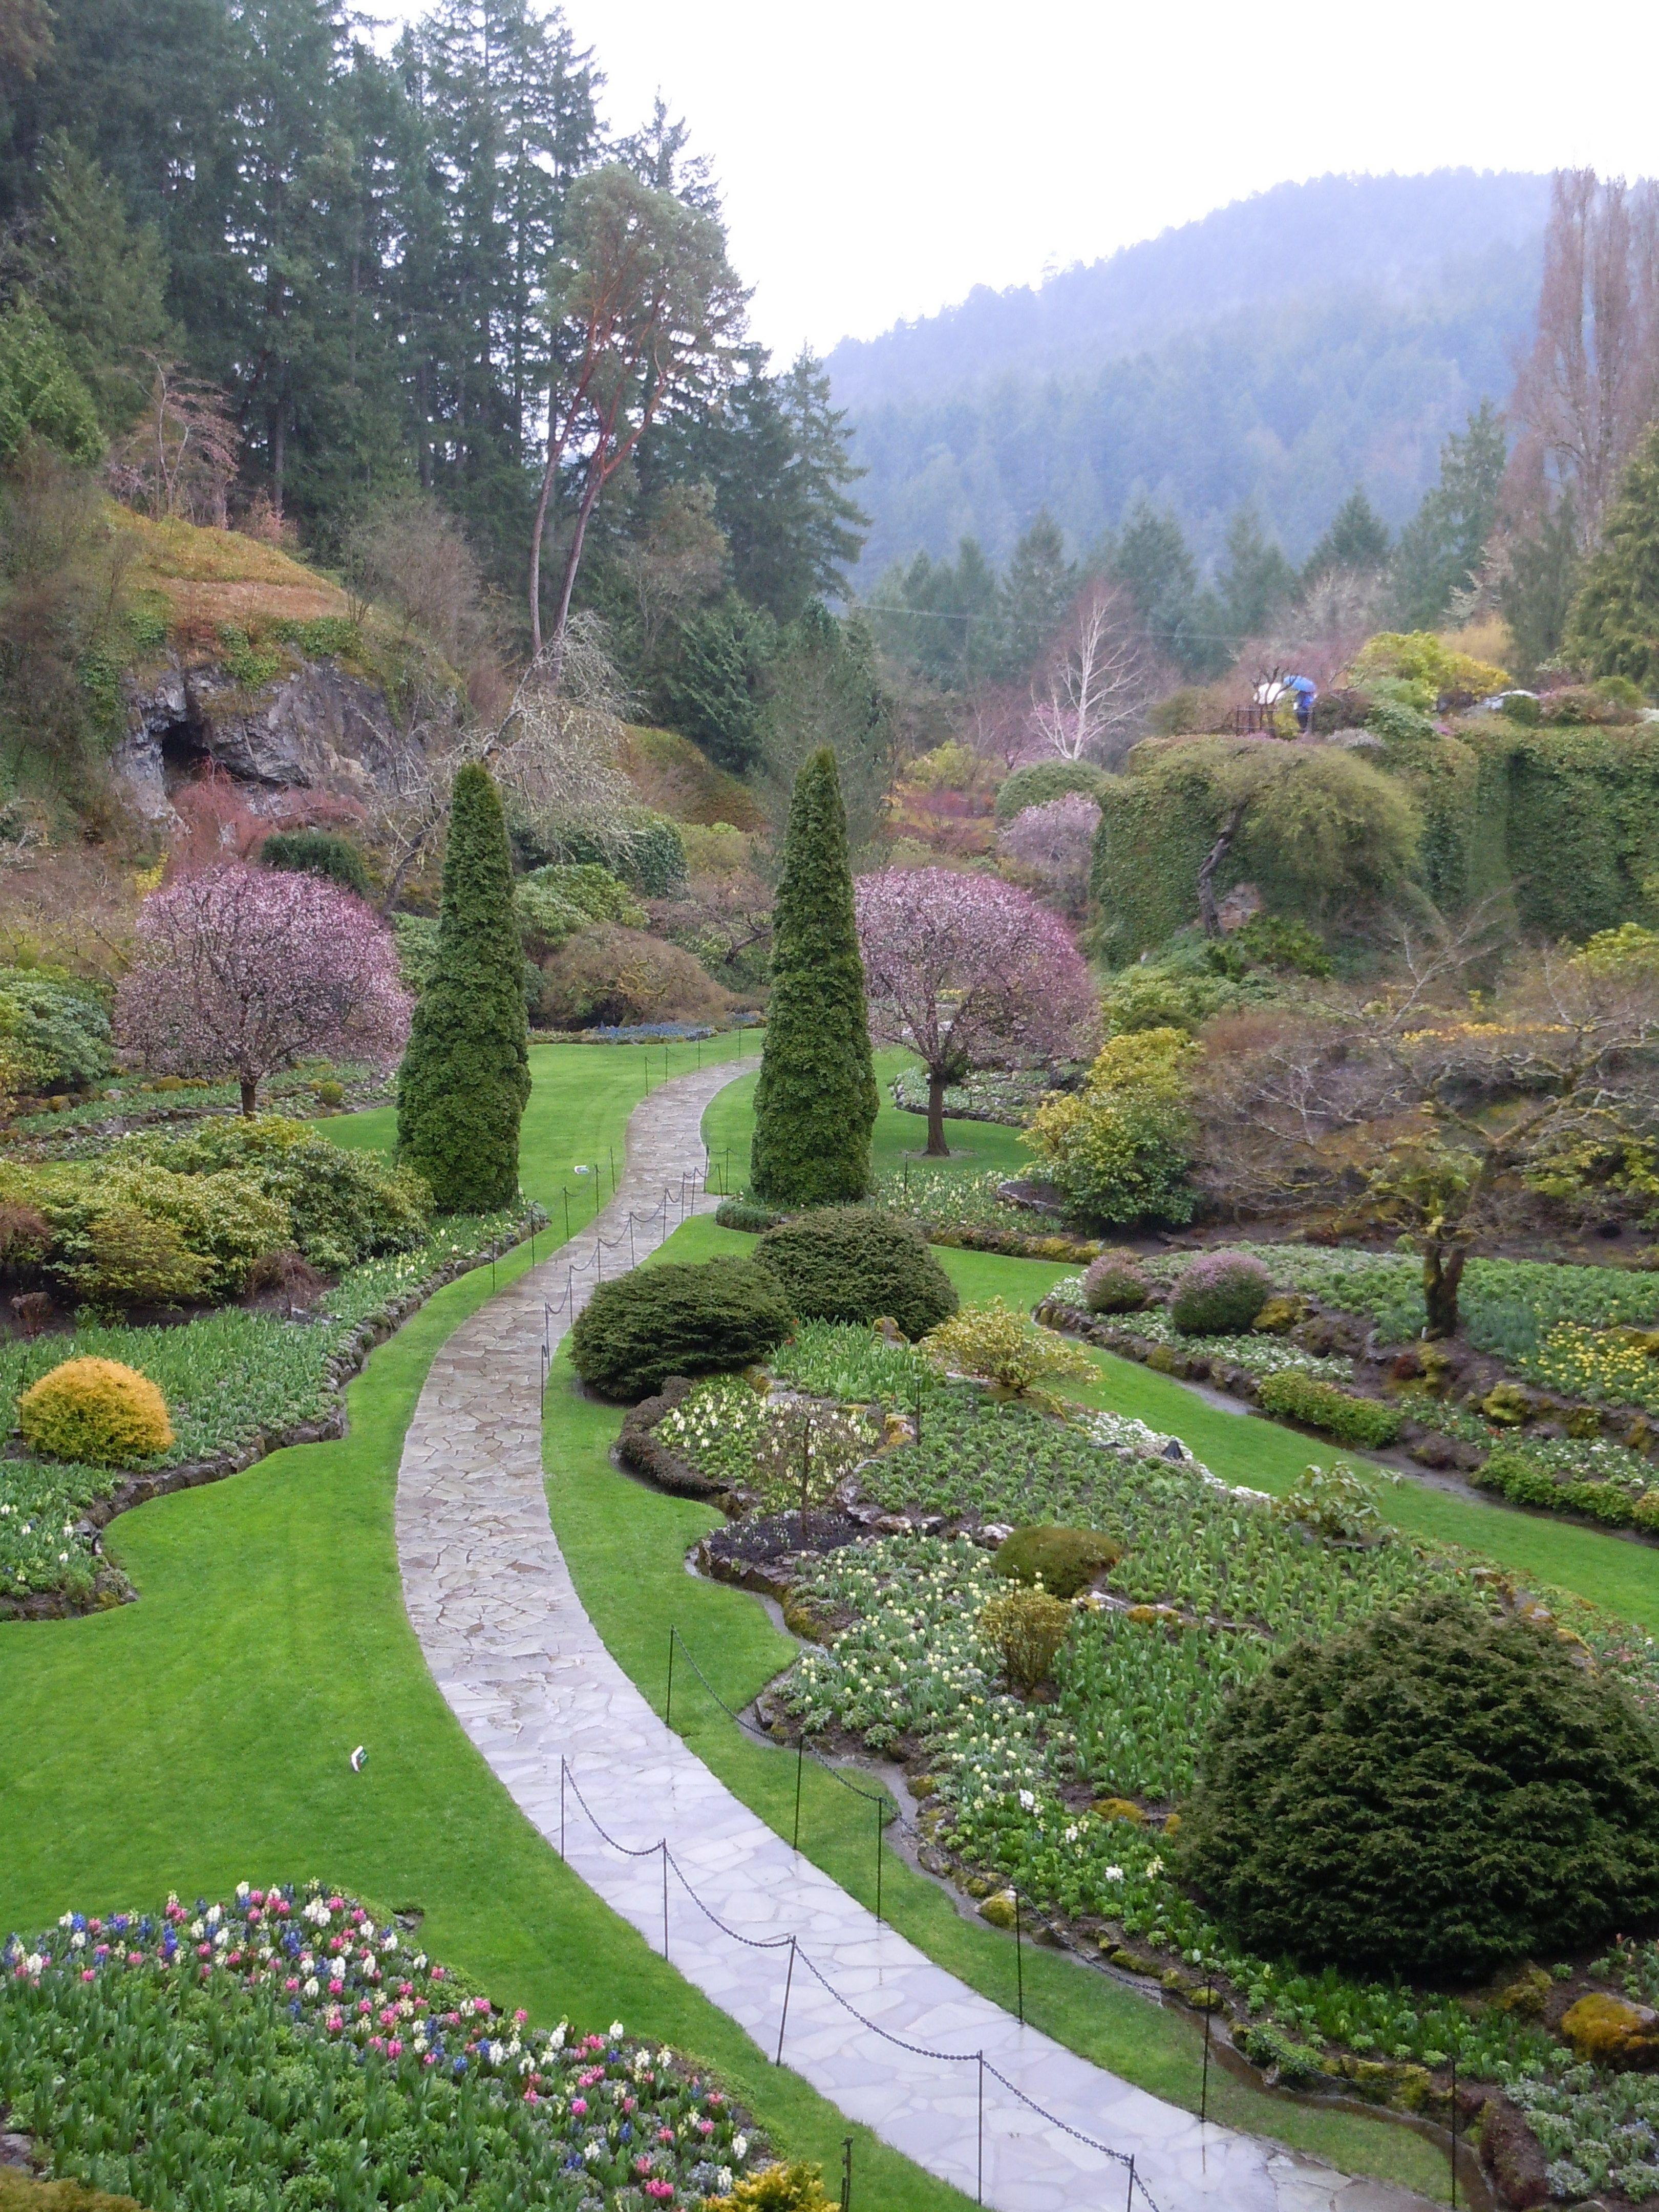 Victoria Canada Buchart Gardens (raining) April 2012